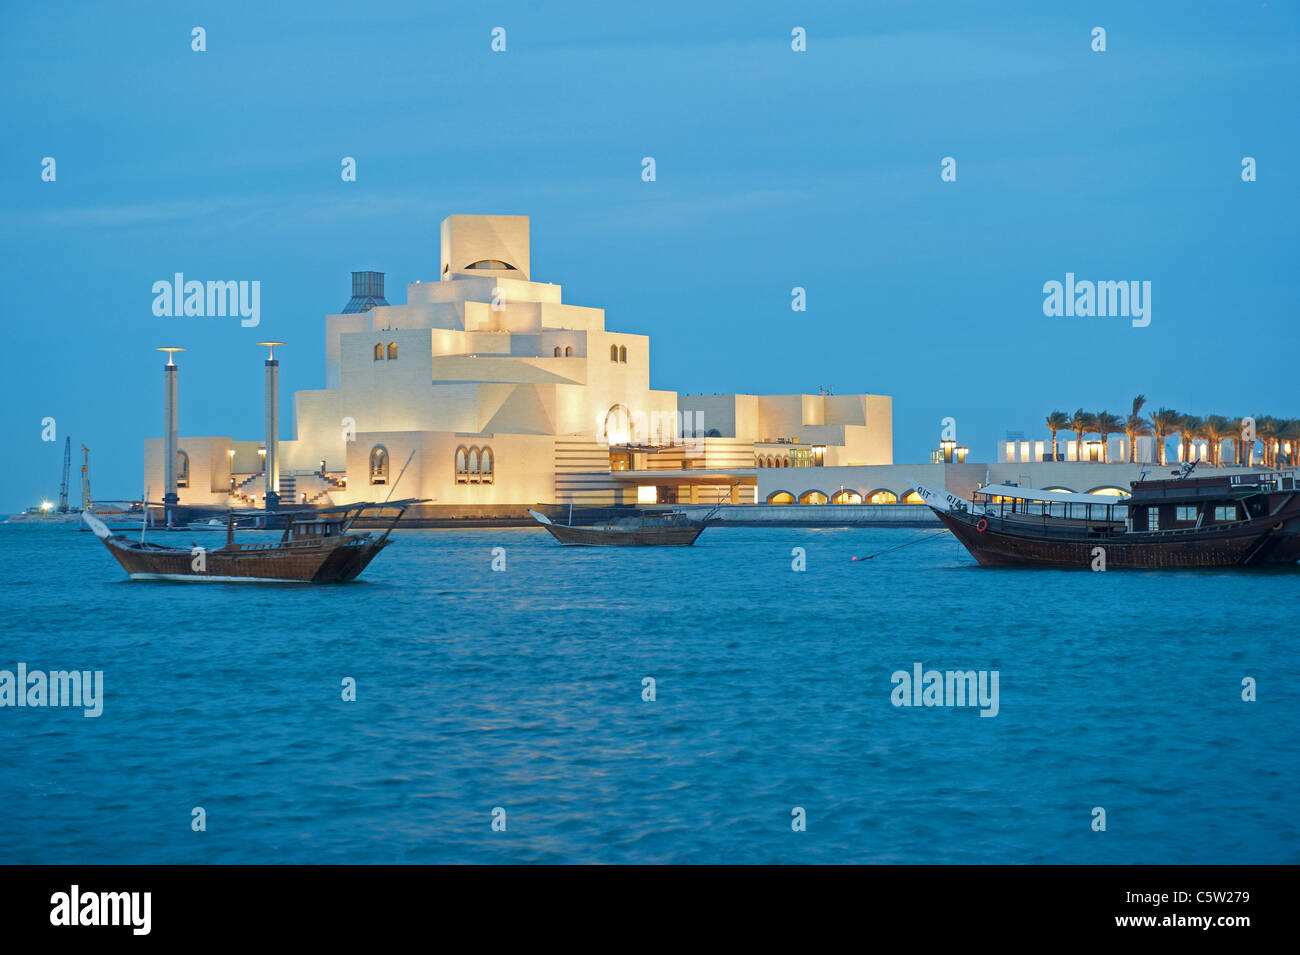 islamic museum dusk doha qatar - Stock Image